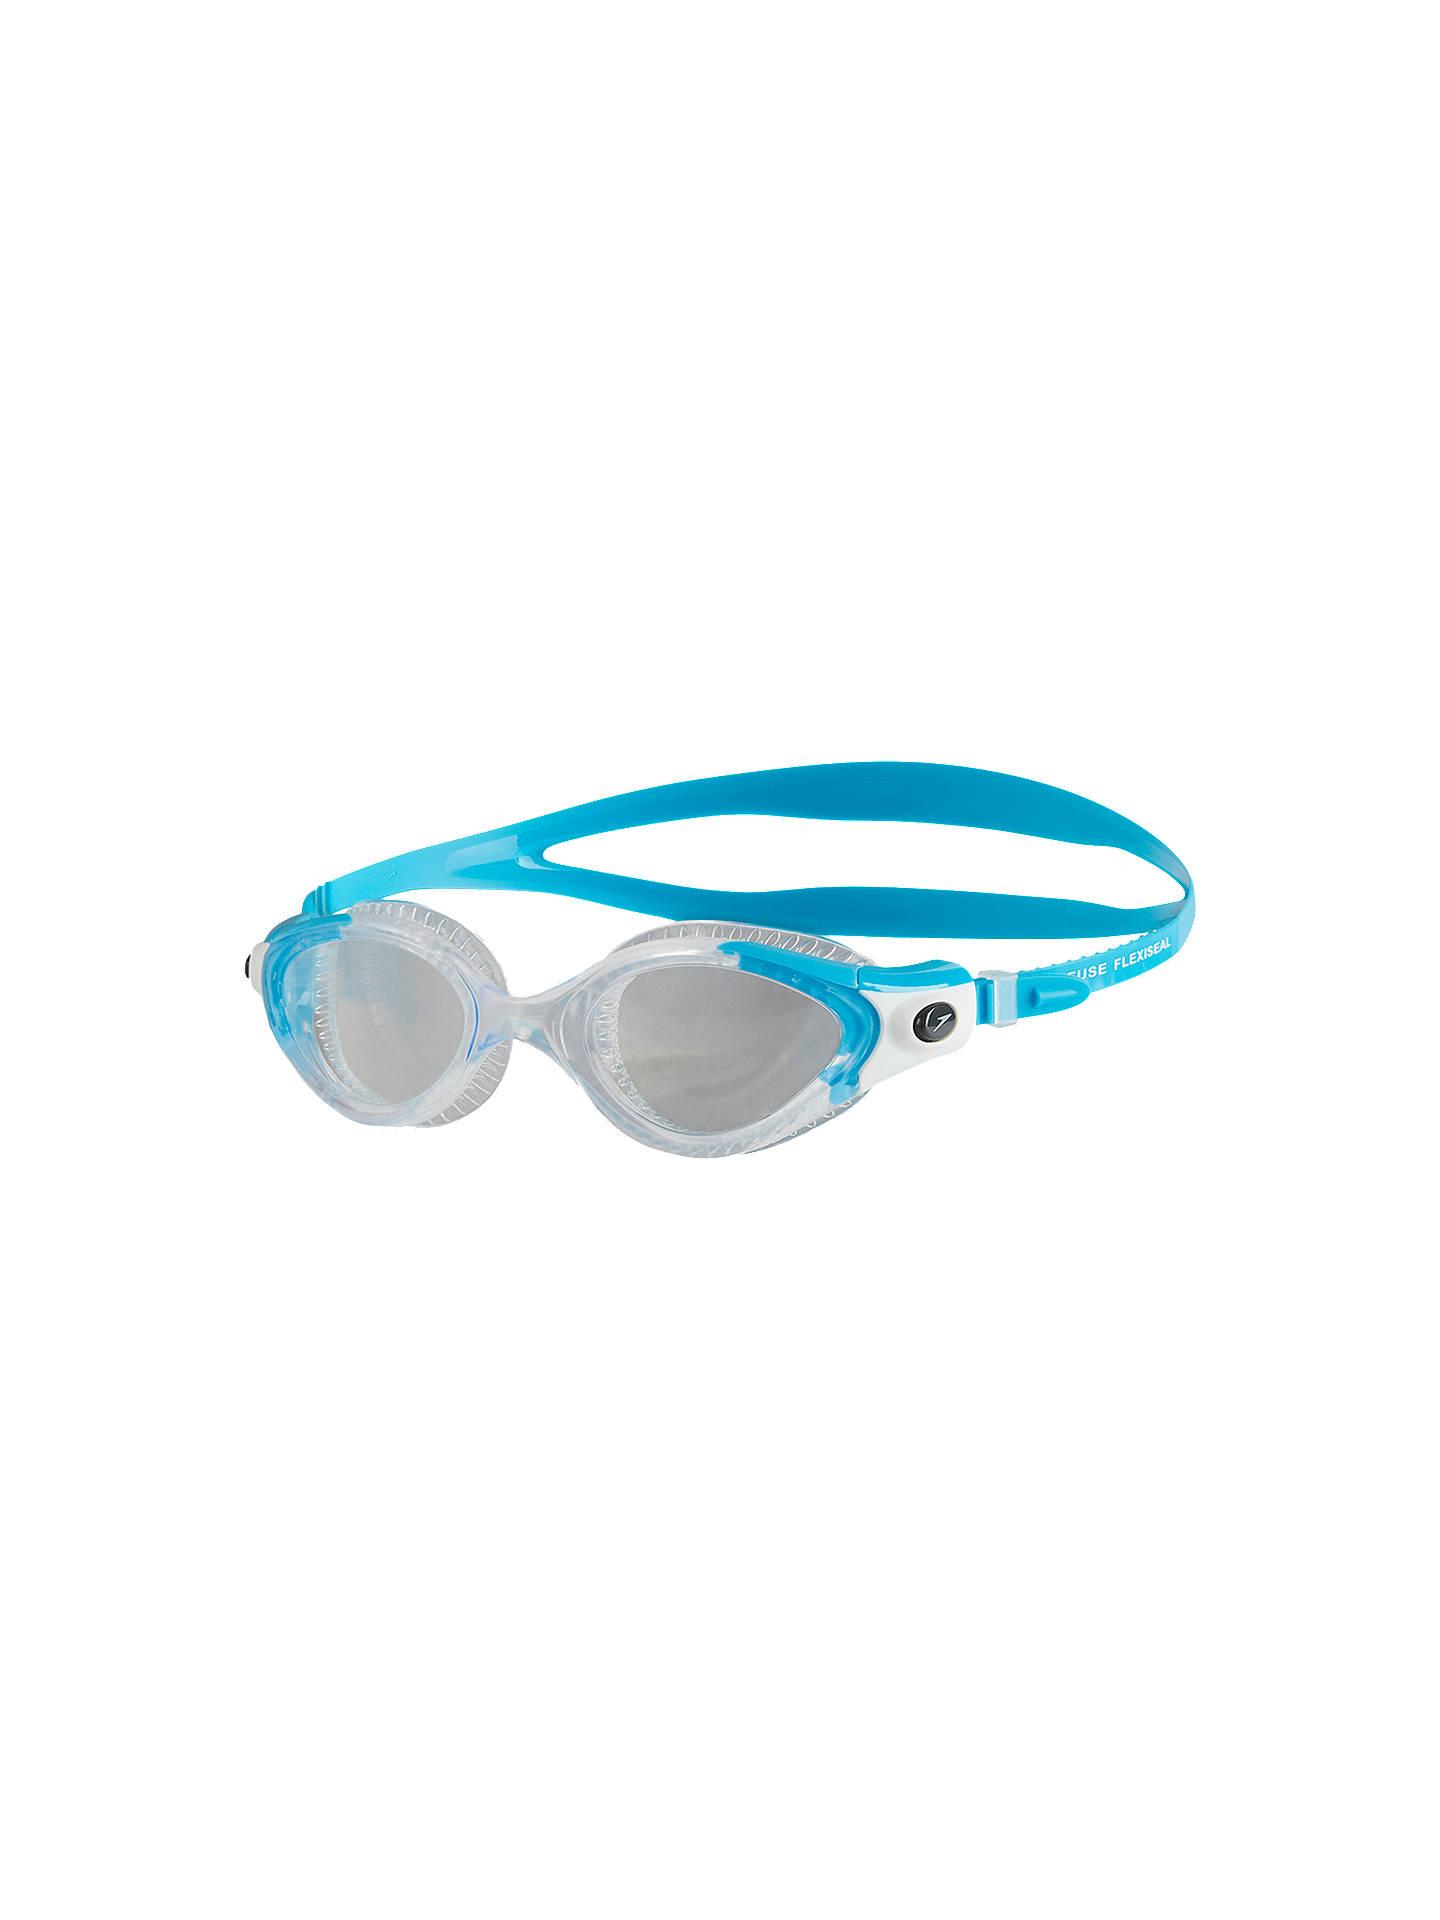 0c4d80d152 Buy Speedo Futura Biofuse Flexiseal Women s Swimming Goggles